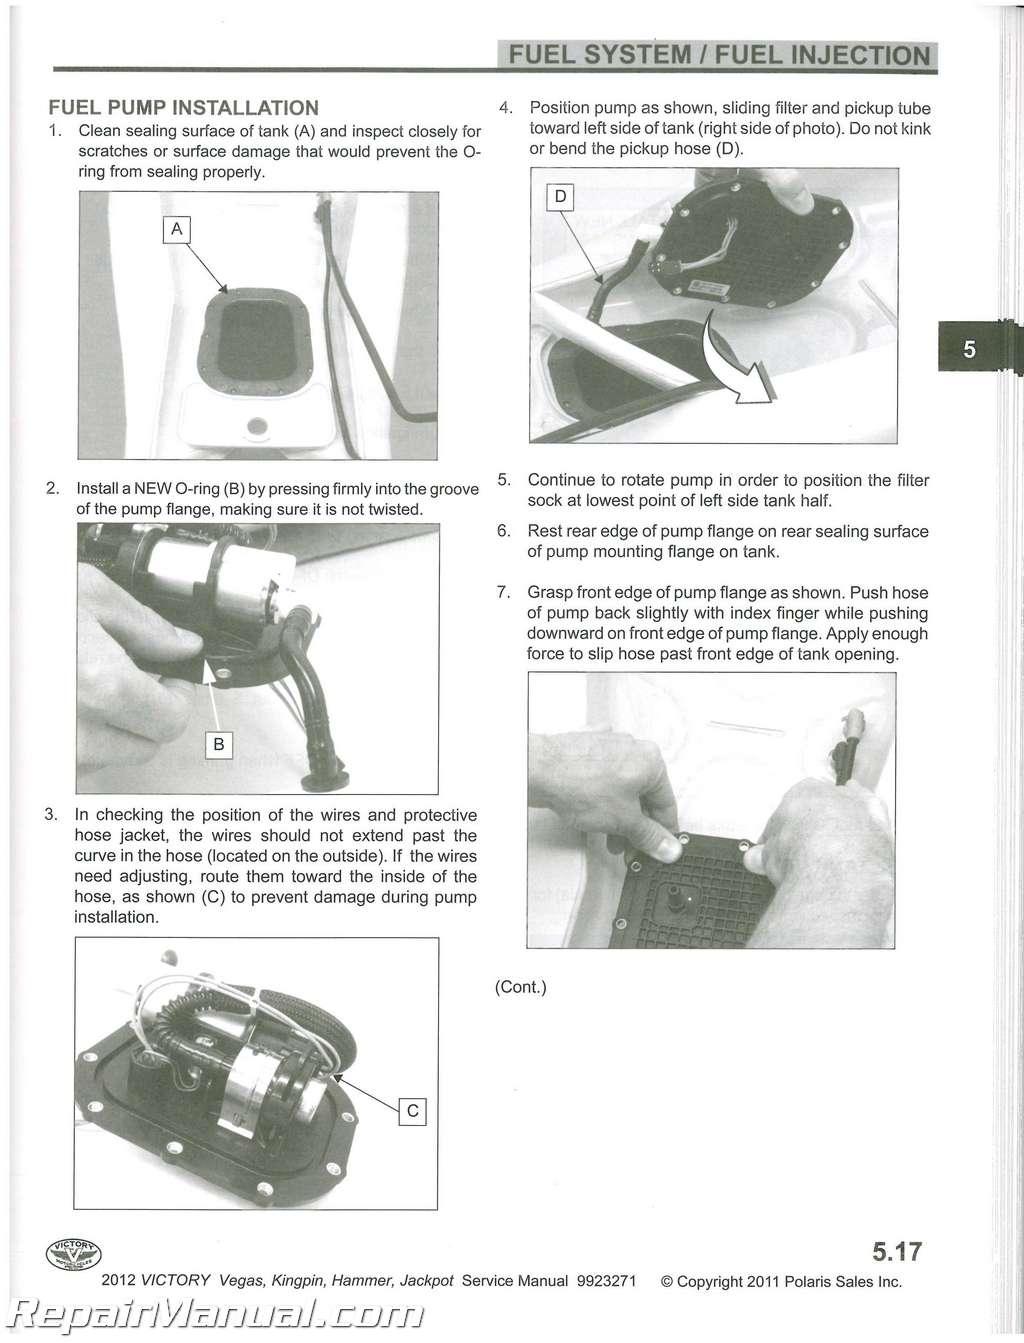 2014 victory highball service manual